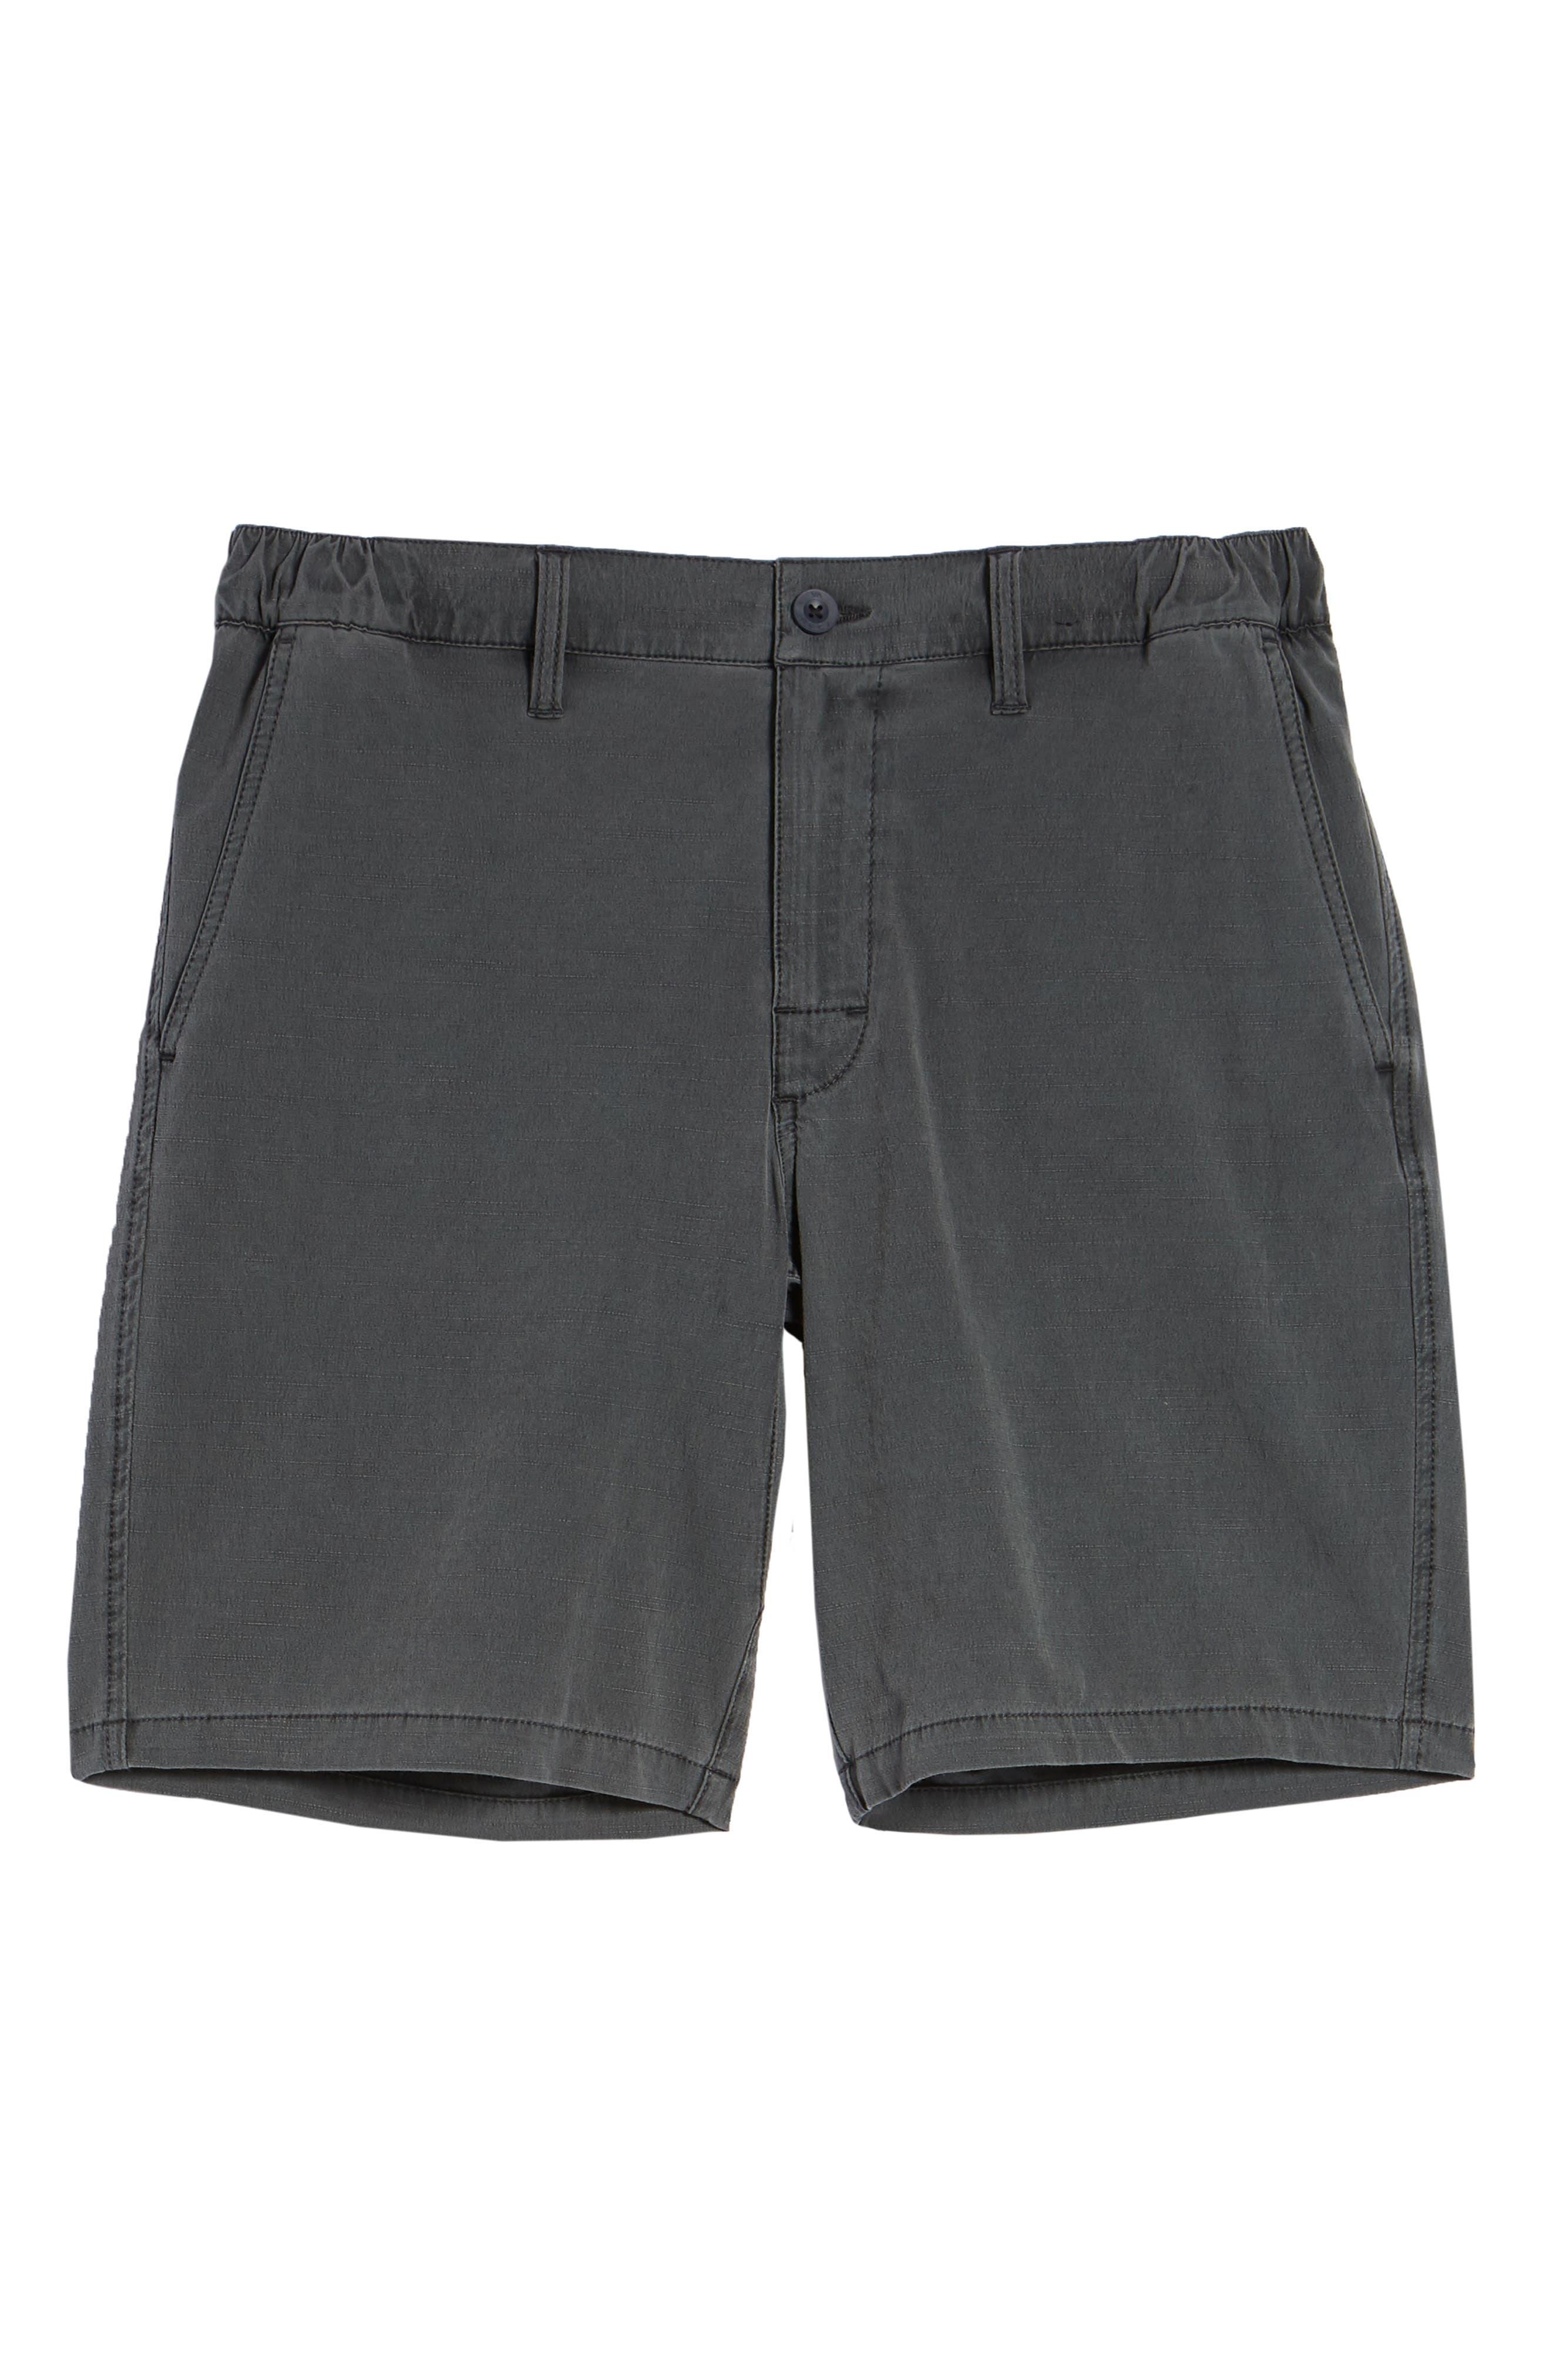 All Time Coastal SOL Hybrid Shorts,                             Alternate thumbnail 6, color,                             GREY SKULL